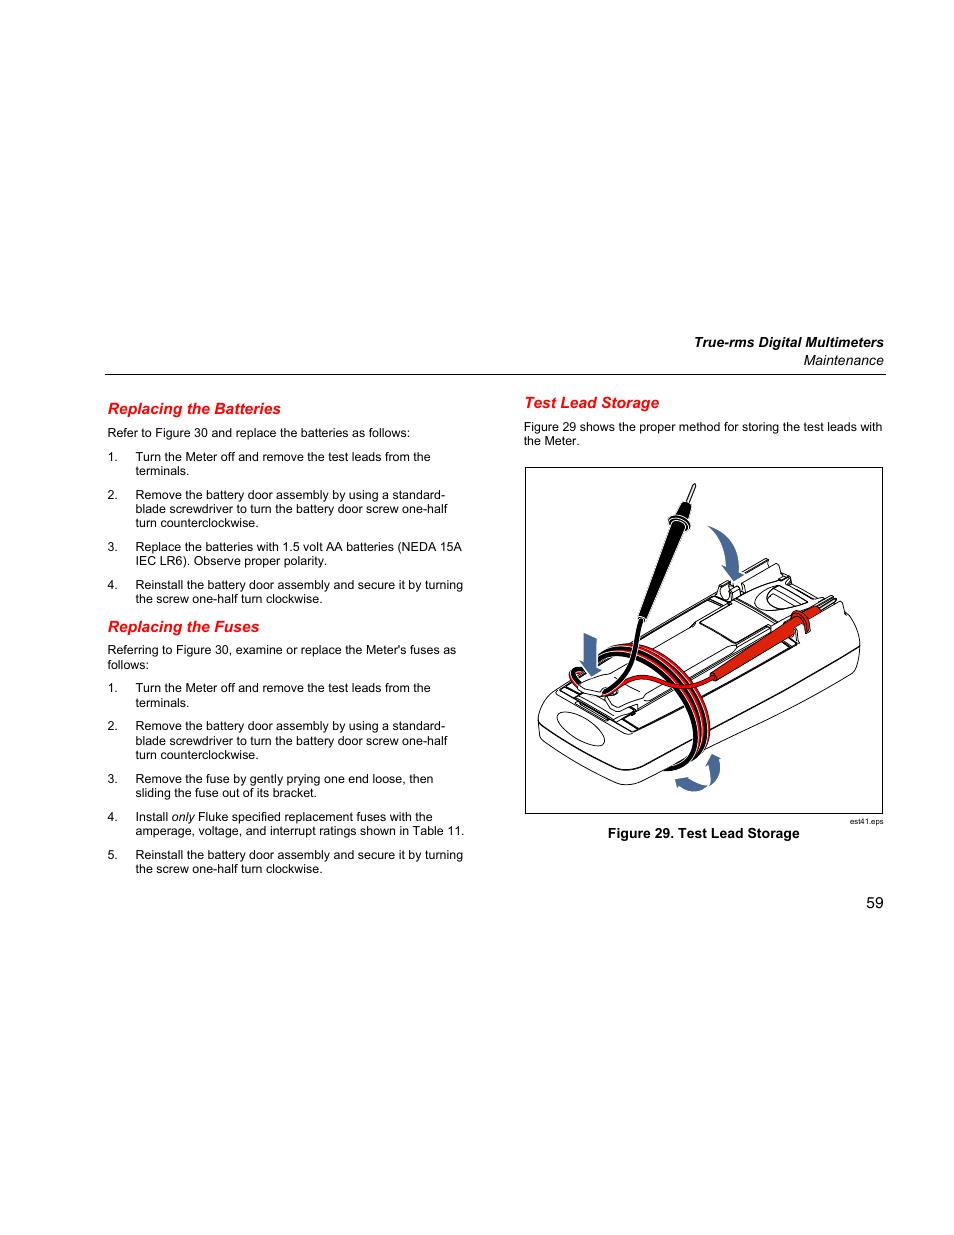 replacing the batteries replacing the fuses test lead storage rh manualsdir com Fluke Digital Multimeter Fluke Multimeter